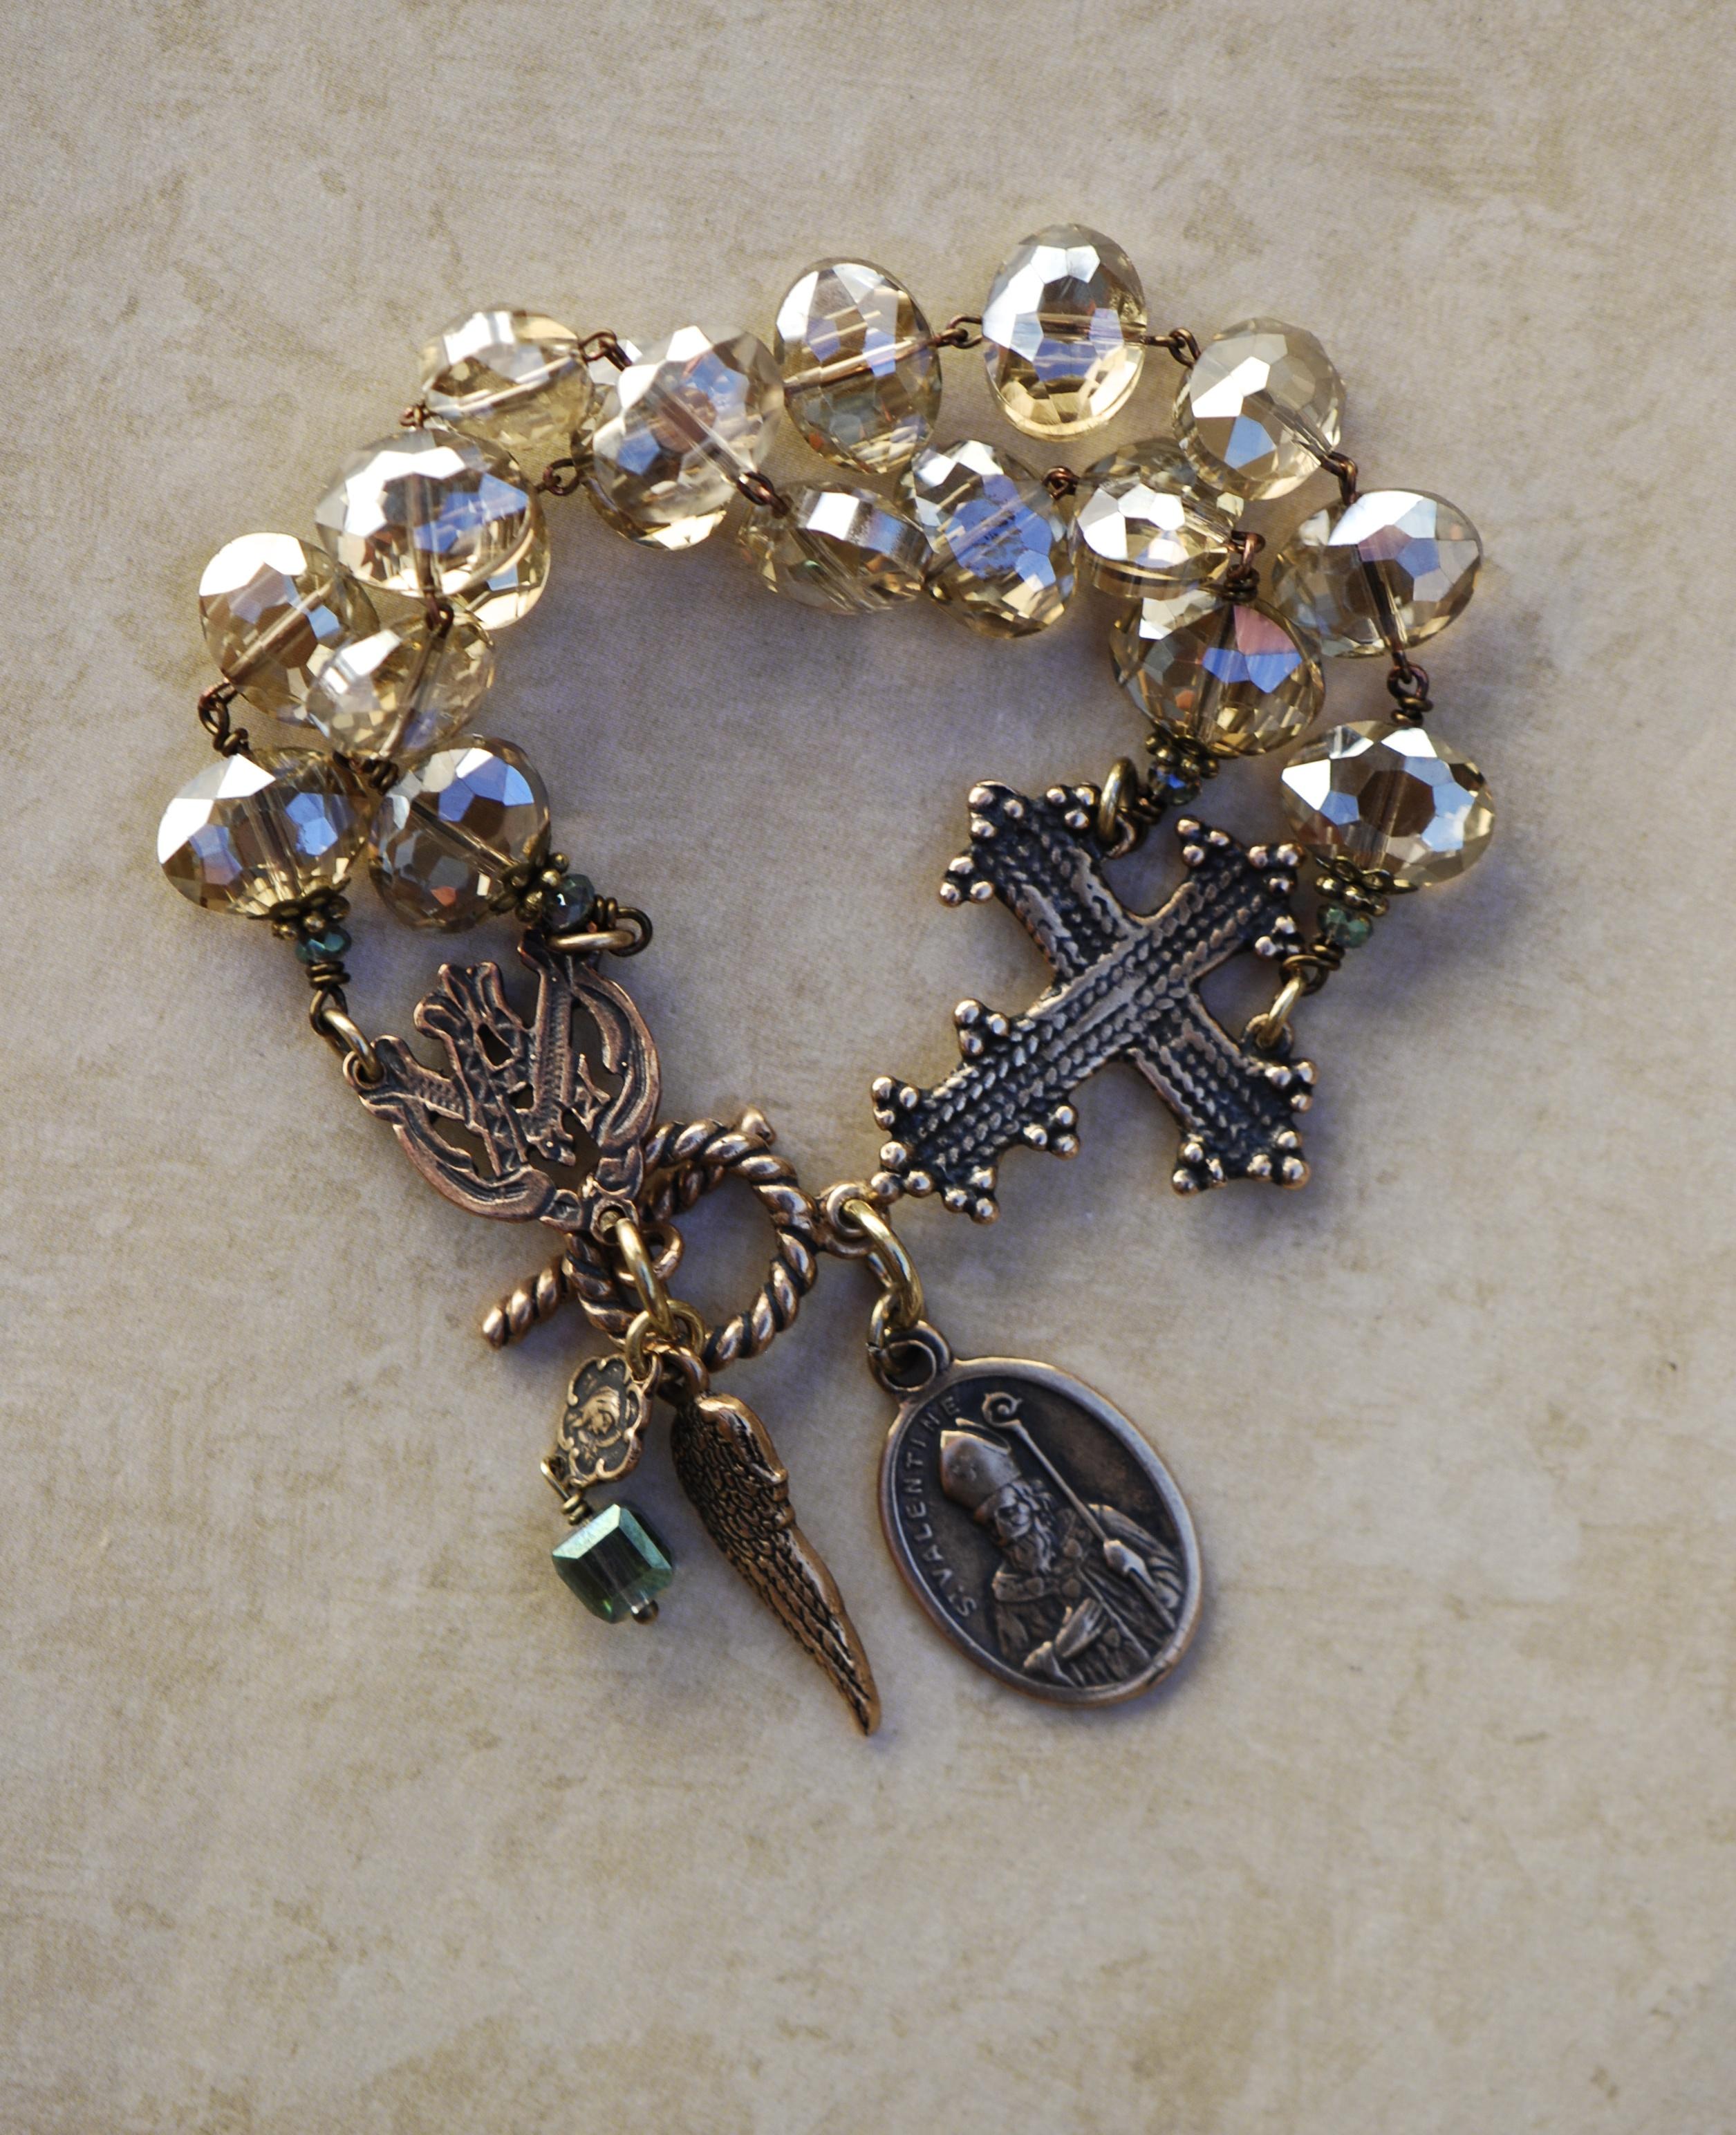 Bracelet of St. Valentine